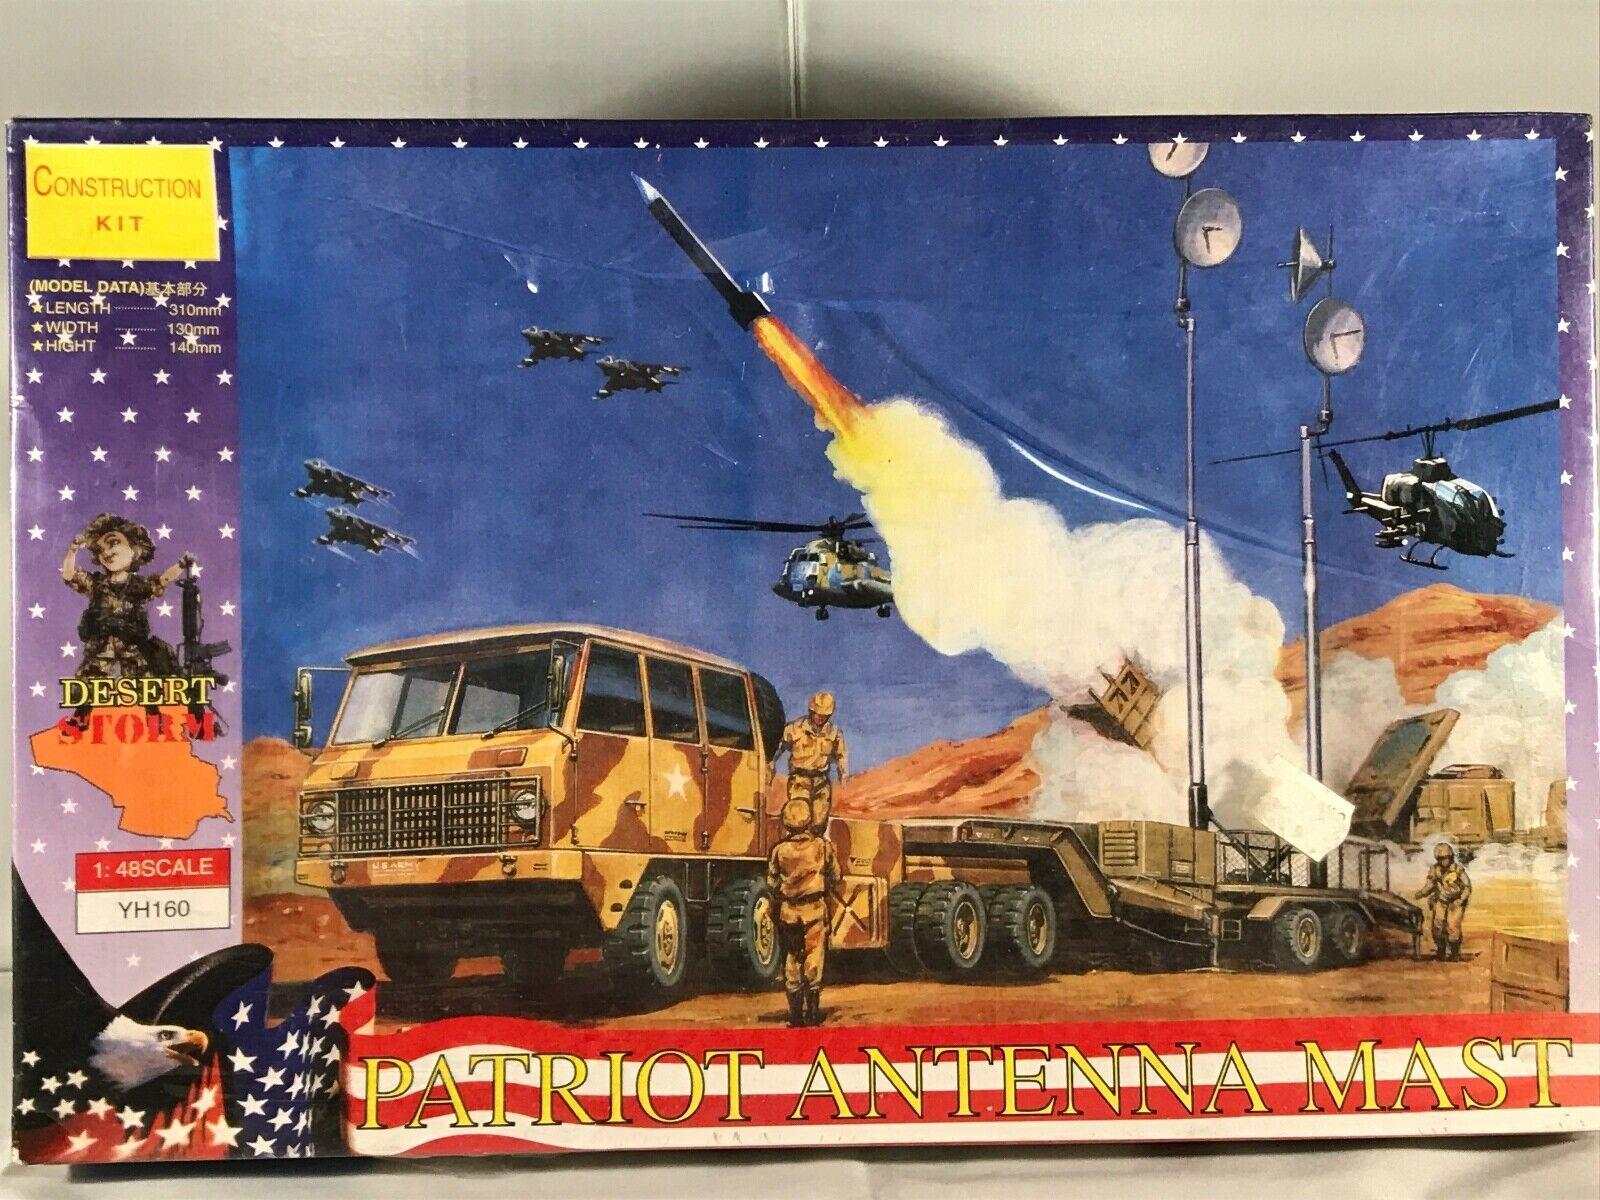 Desert Storm - Patriot - Antenna Mast YH160 Construction Kit 1 48 No.4